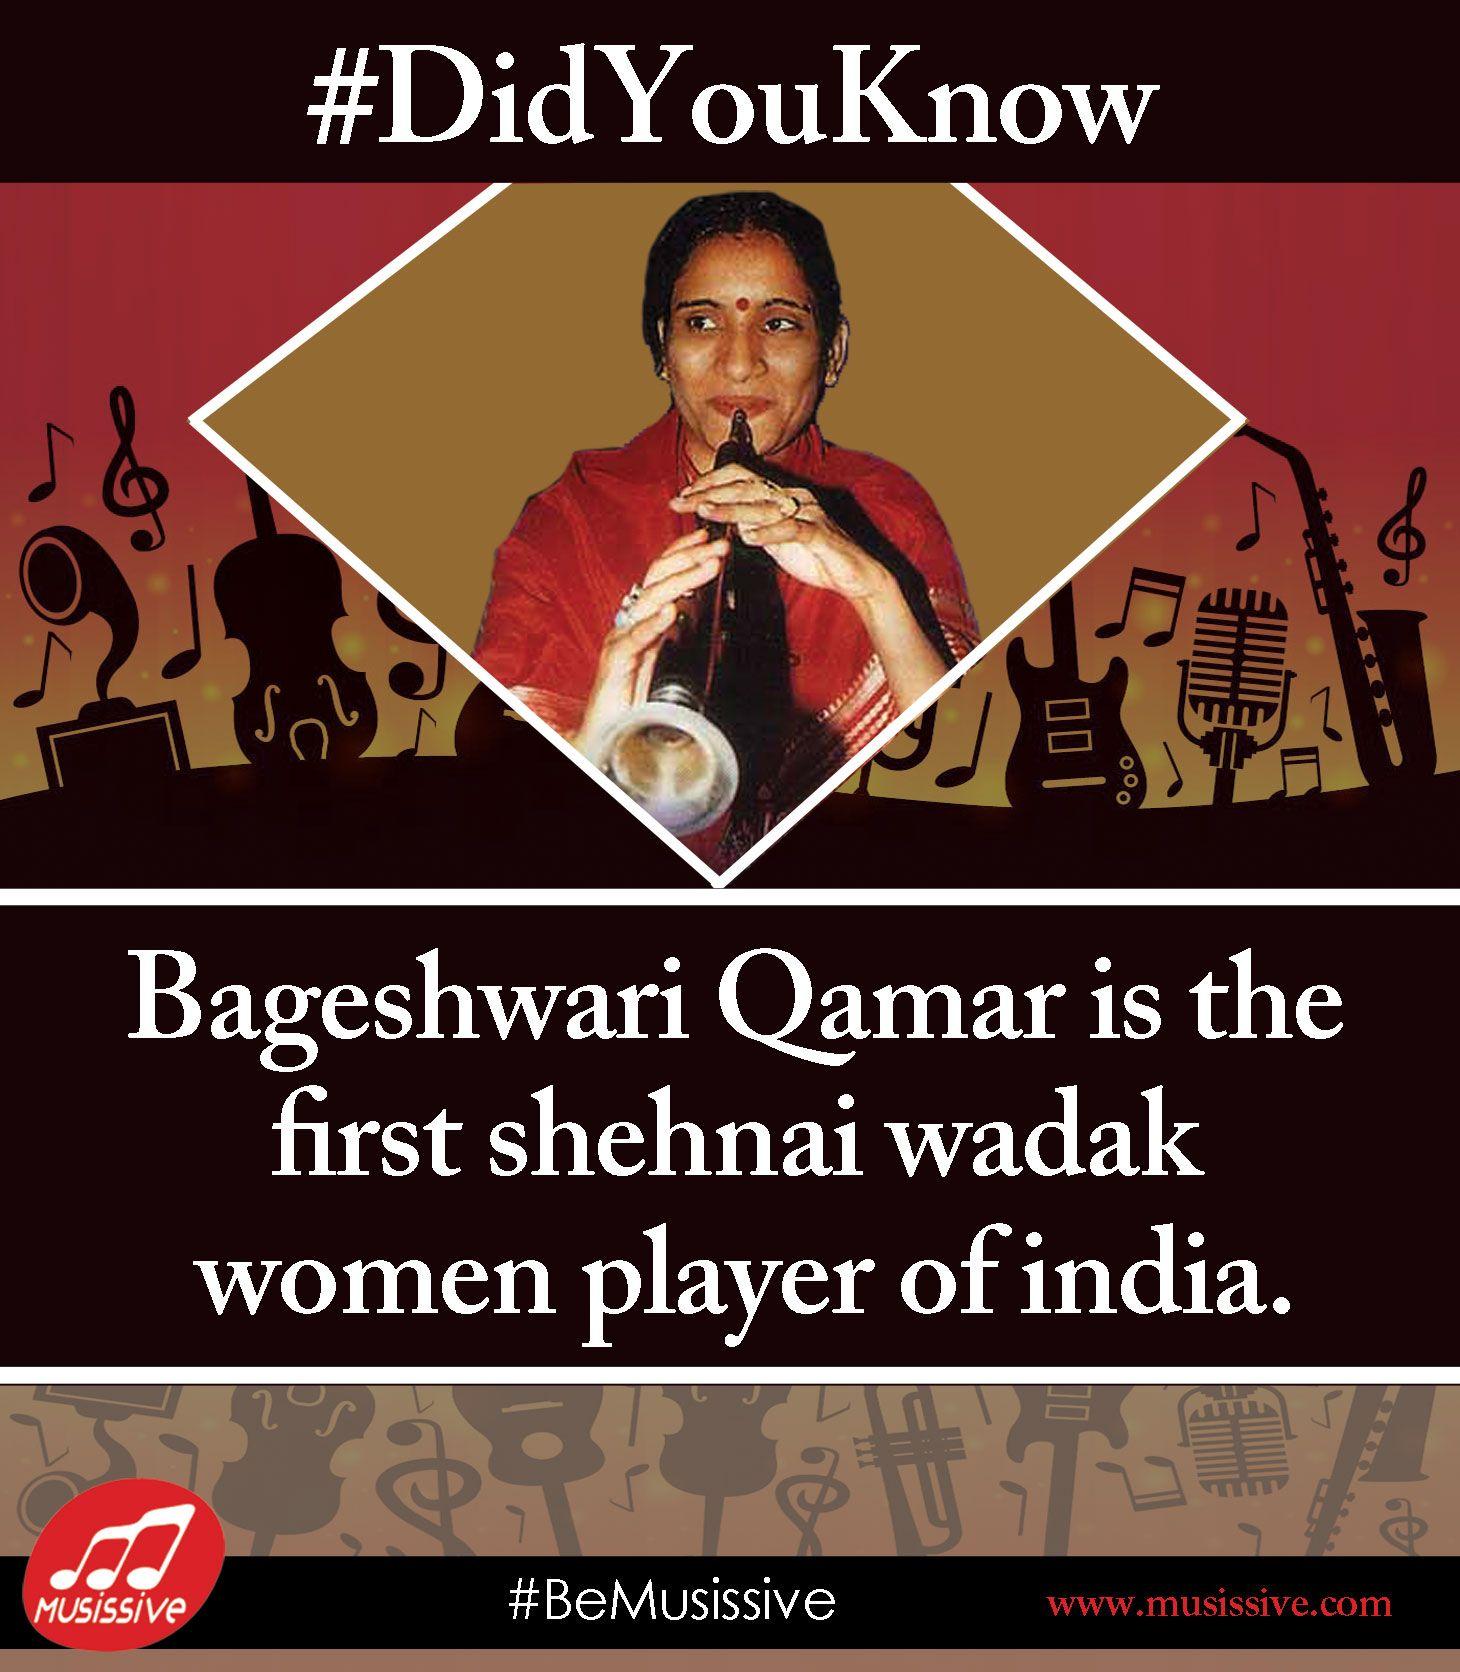 Bageshwari Qamar is the first shehnai wadak women player of